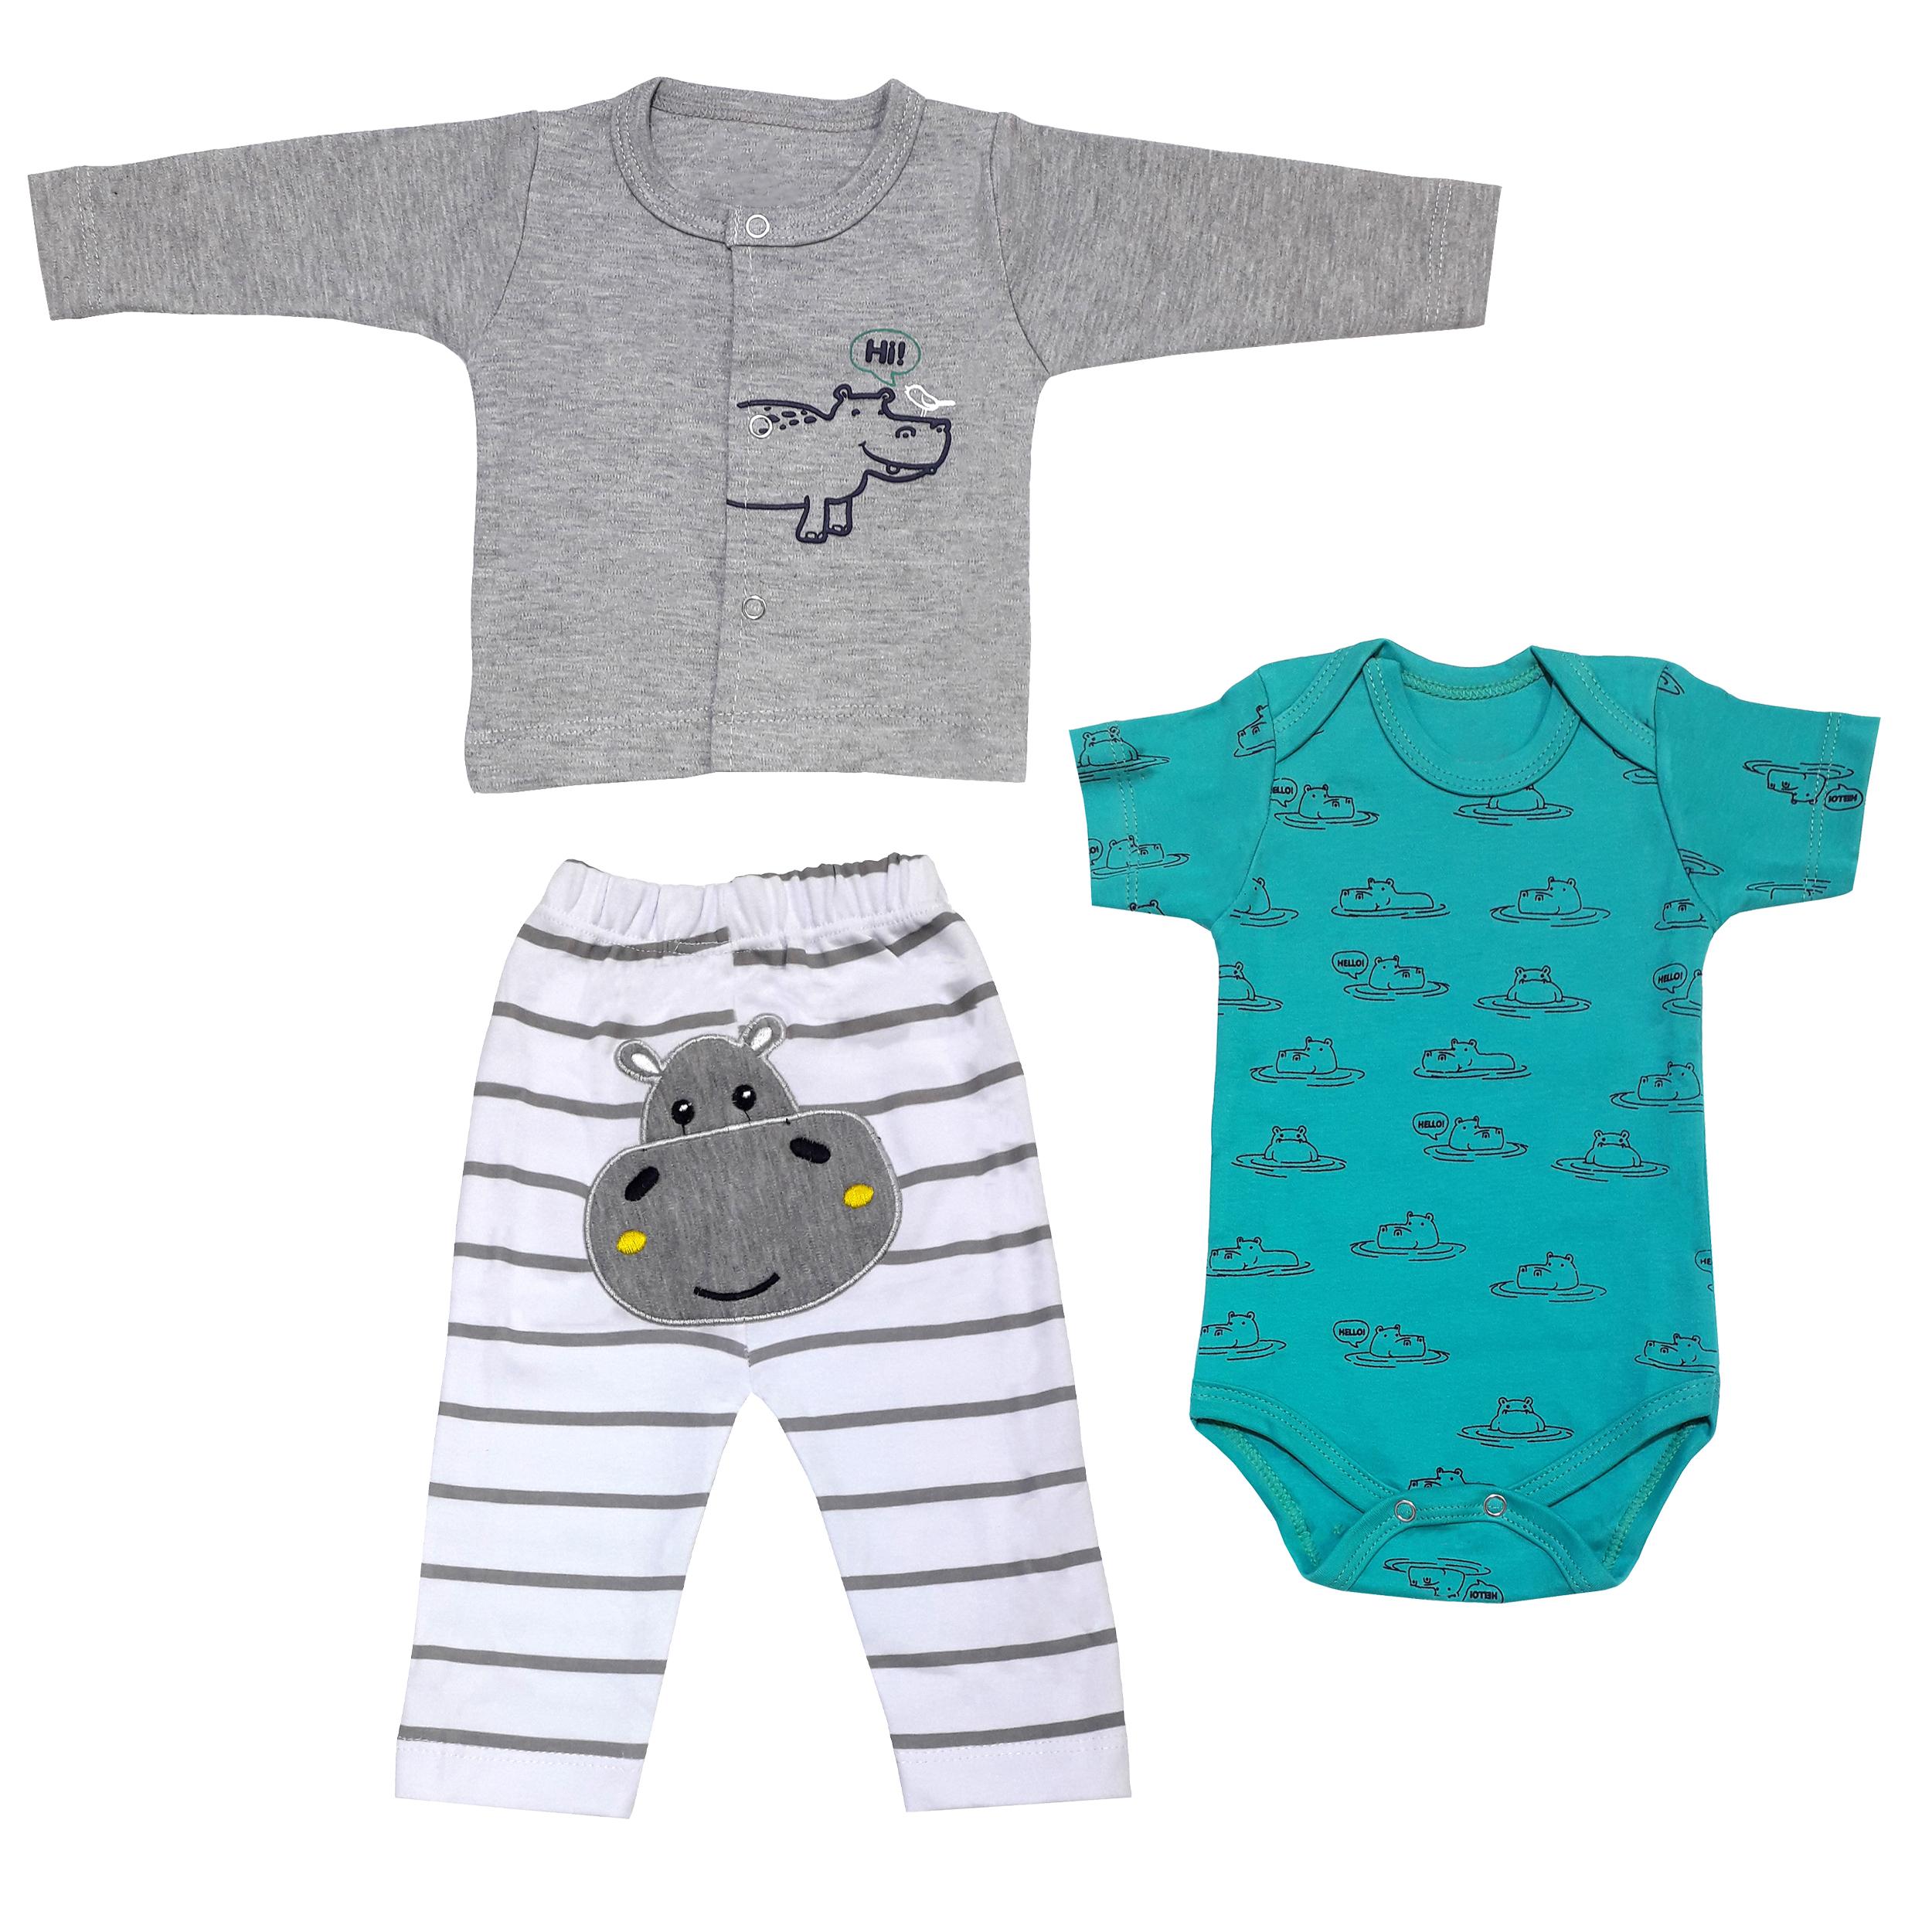 ست 3 تکه لباس نوزادی پسرانه طرح اسب آبی کد 3167